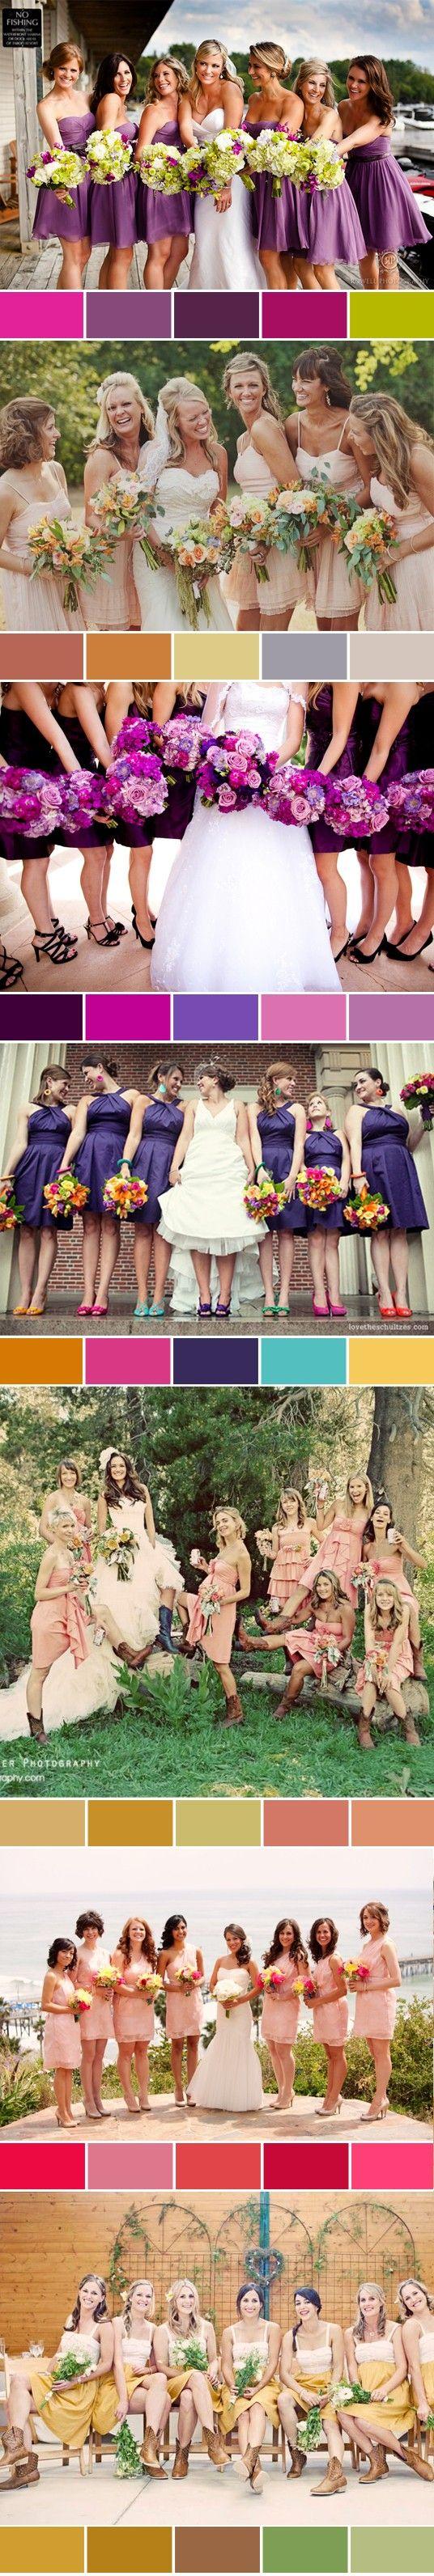 Good website for wedding color schemes wedding dress pinterest